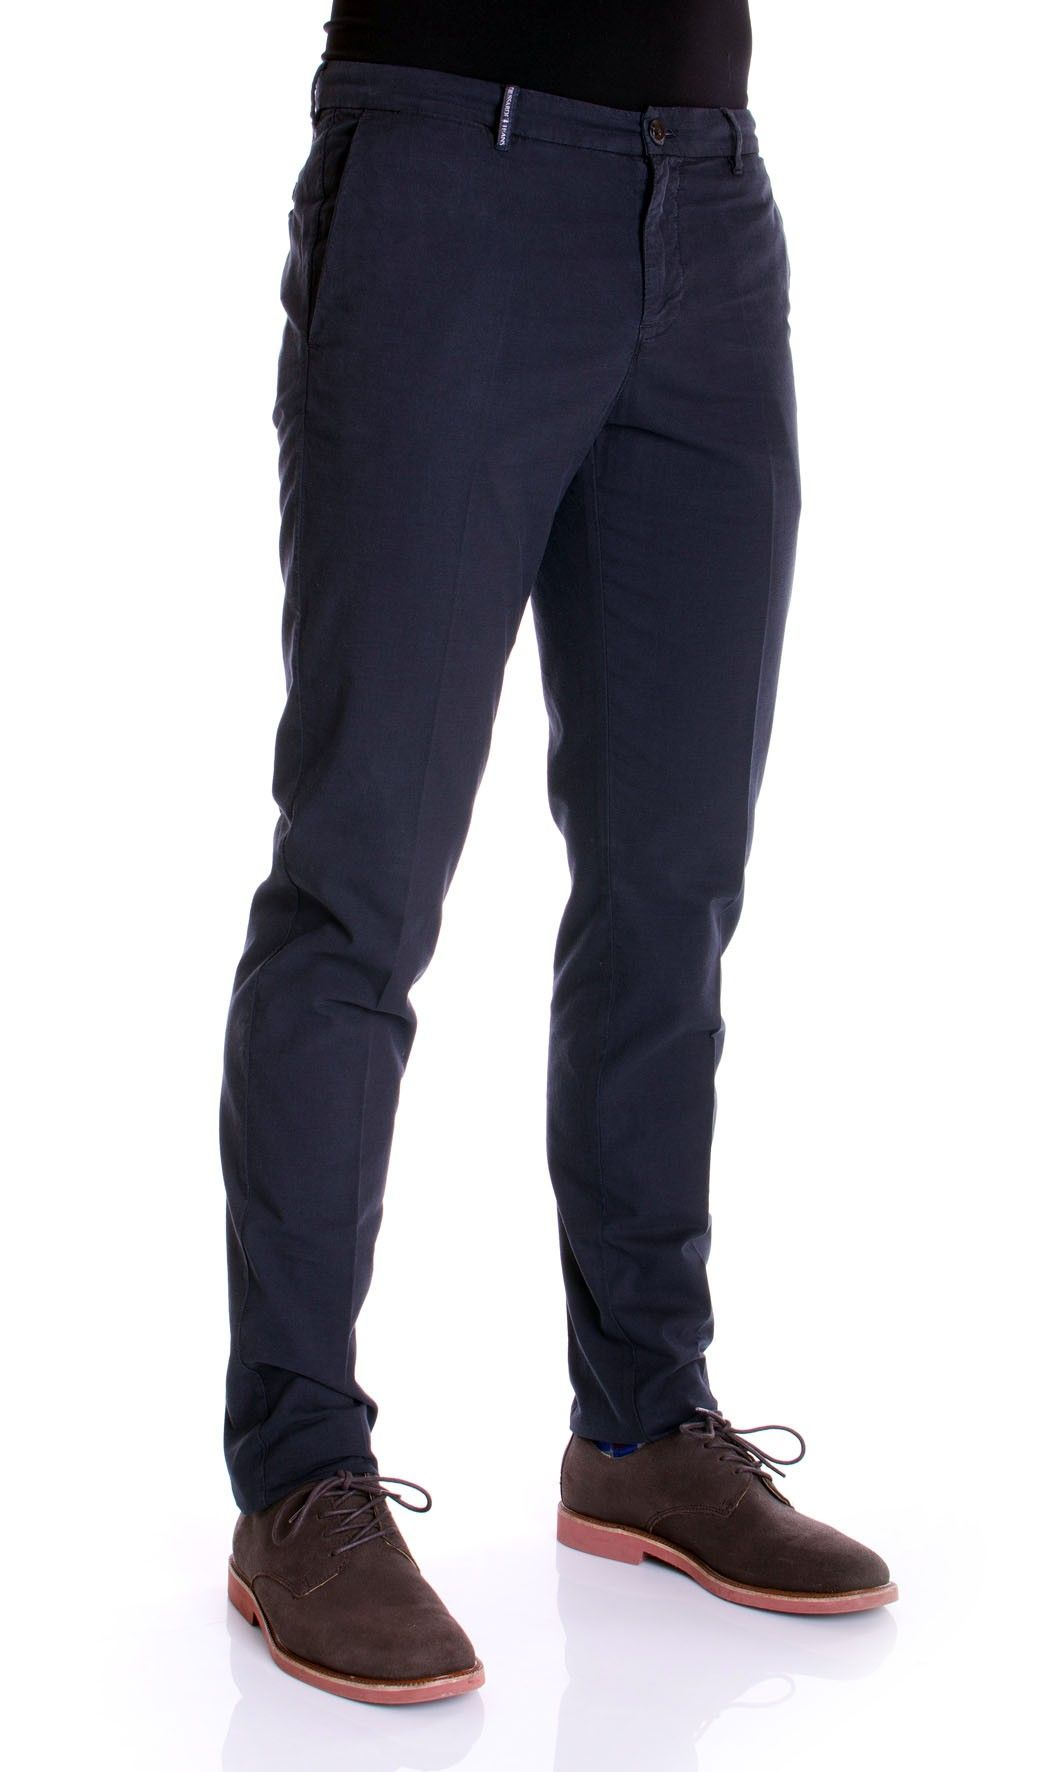 Trussardi Jeans | Pantaloni TRUSSARDI JEANS Uomo Aviator Fit Gabardine stretch Col.Blu Navy su Dursoboutique.com 52P01ZB